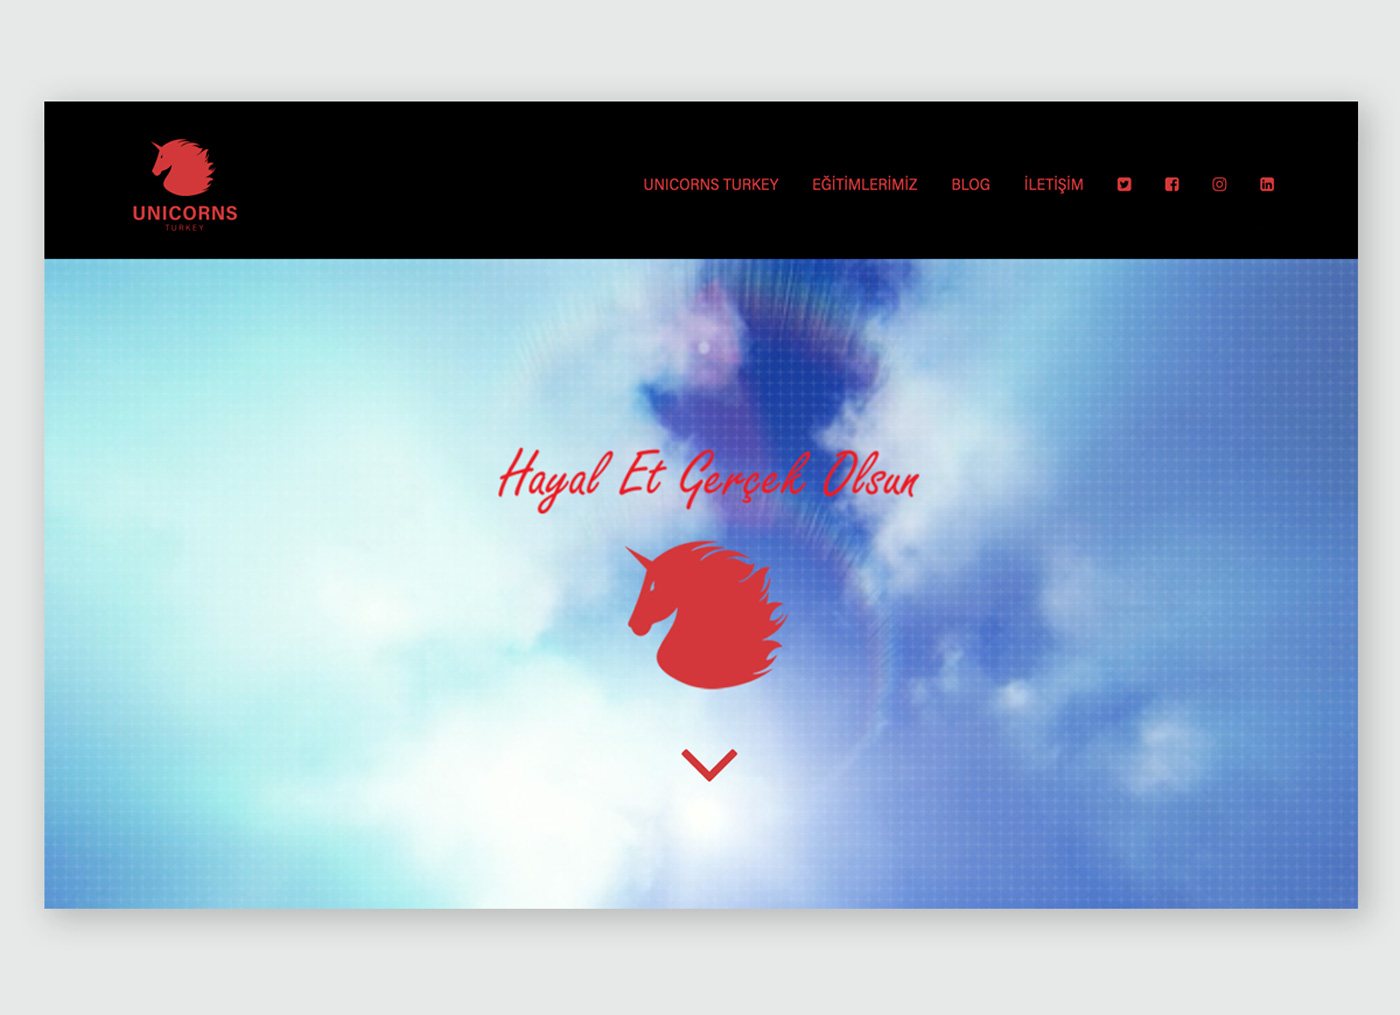 Unicorns Turkey Website Design